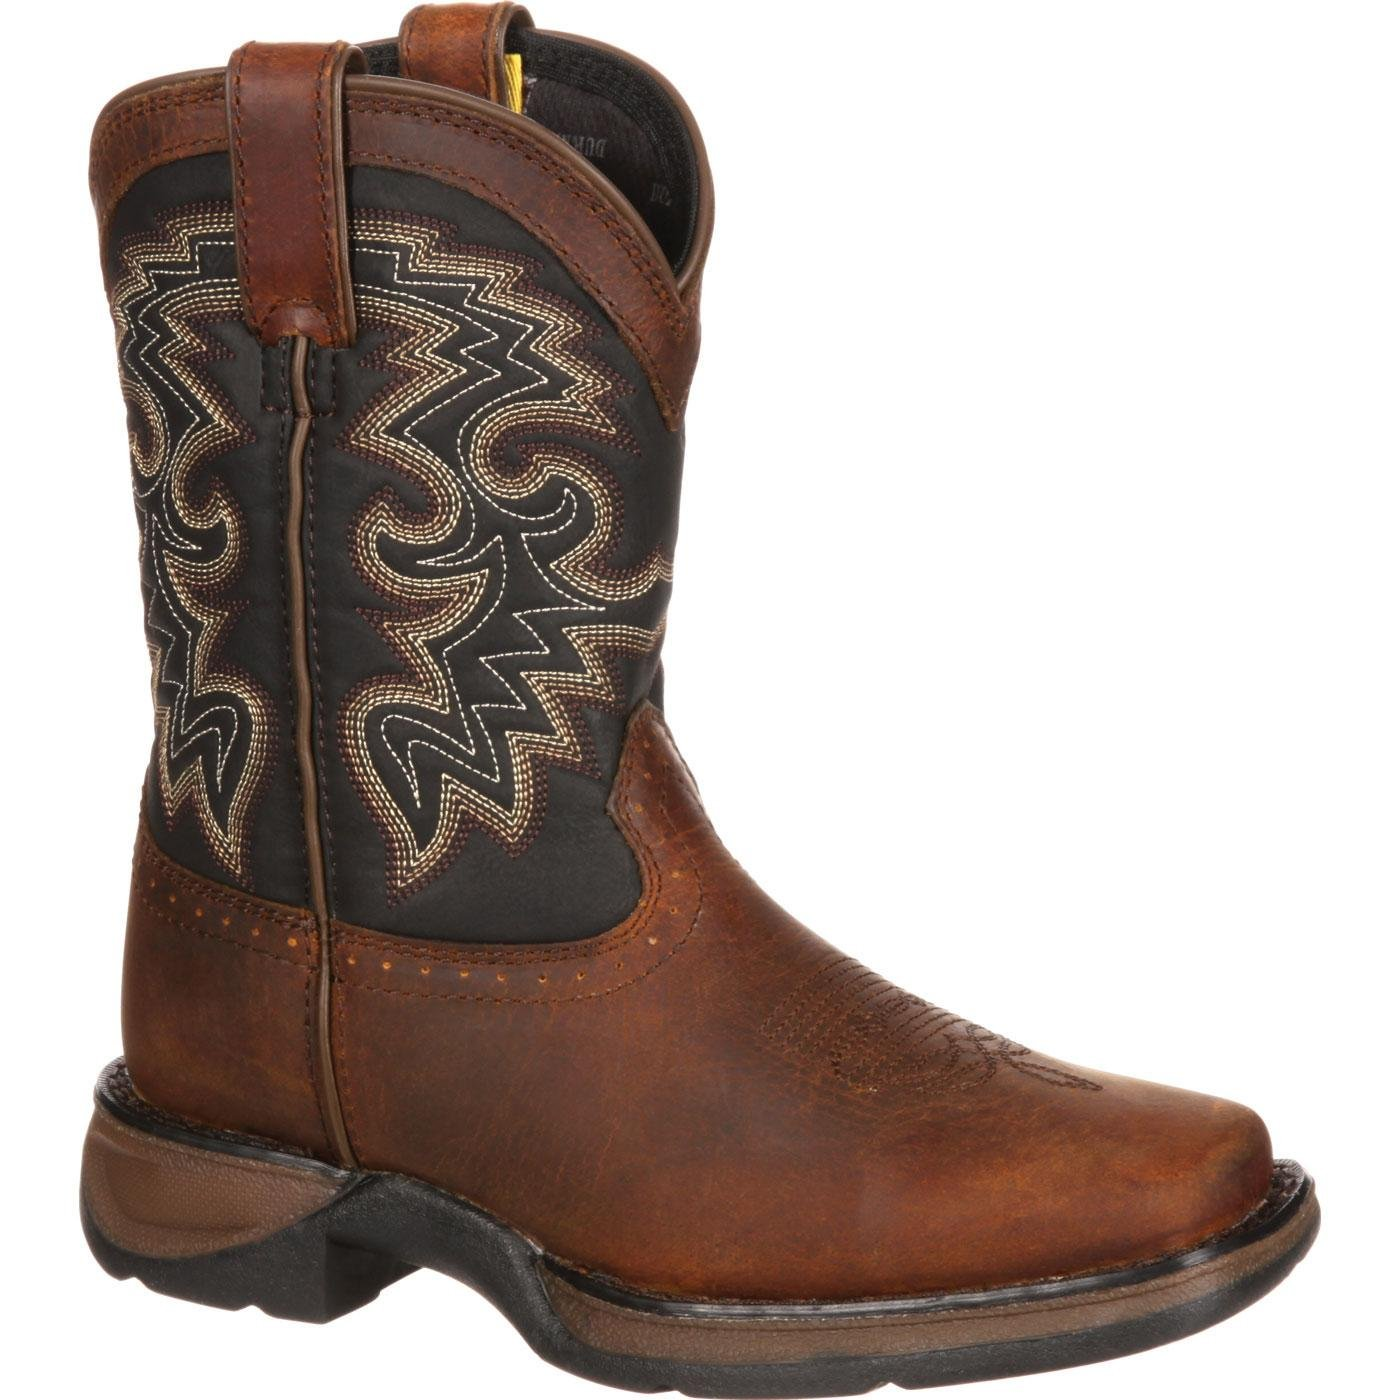 Durango Kids Leather Square Toe Western Cowboy Boot (12.5)